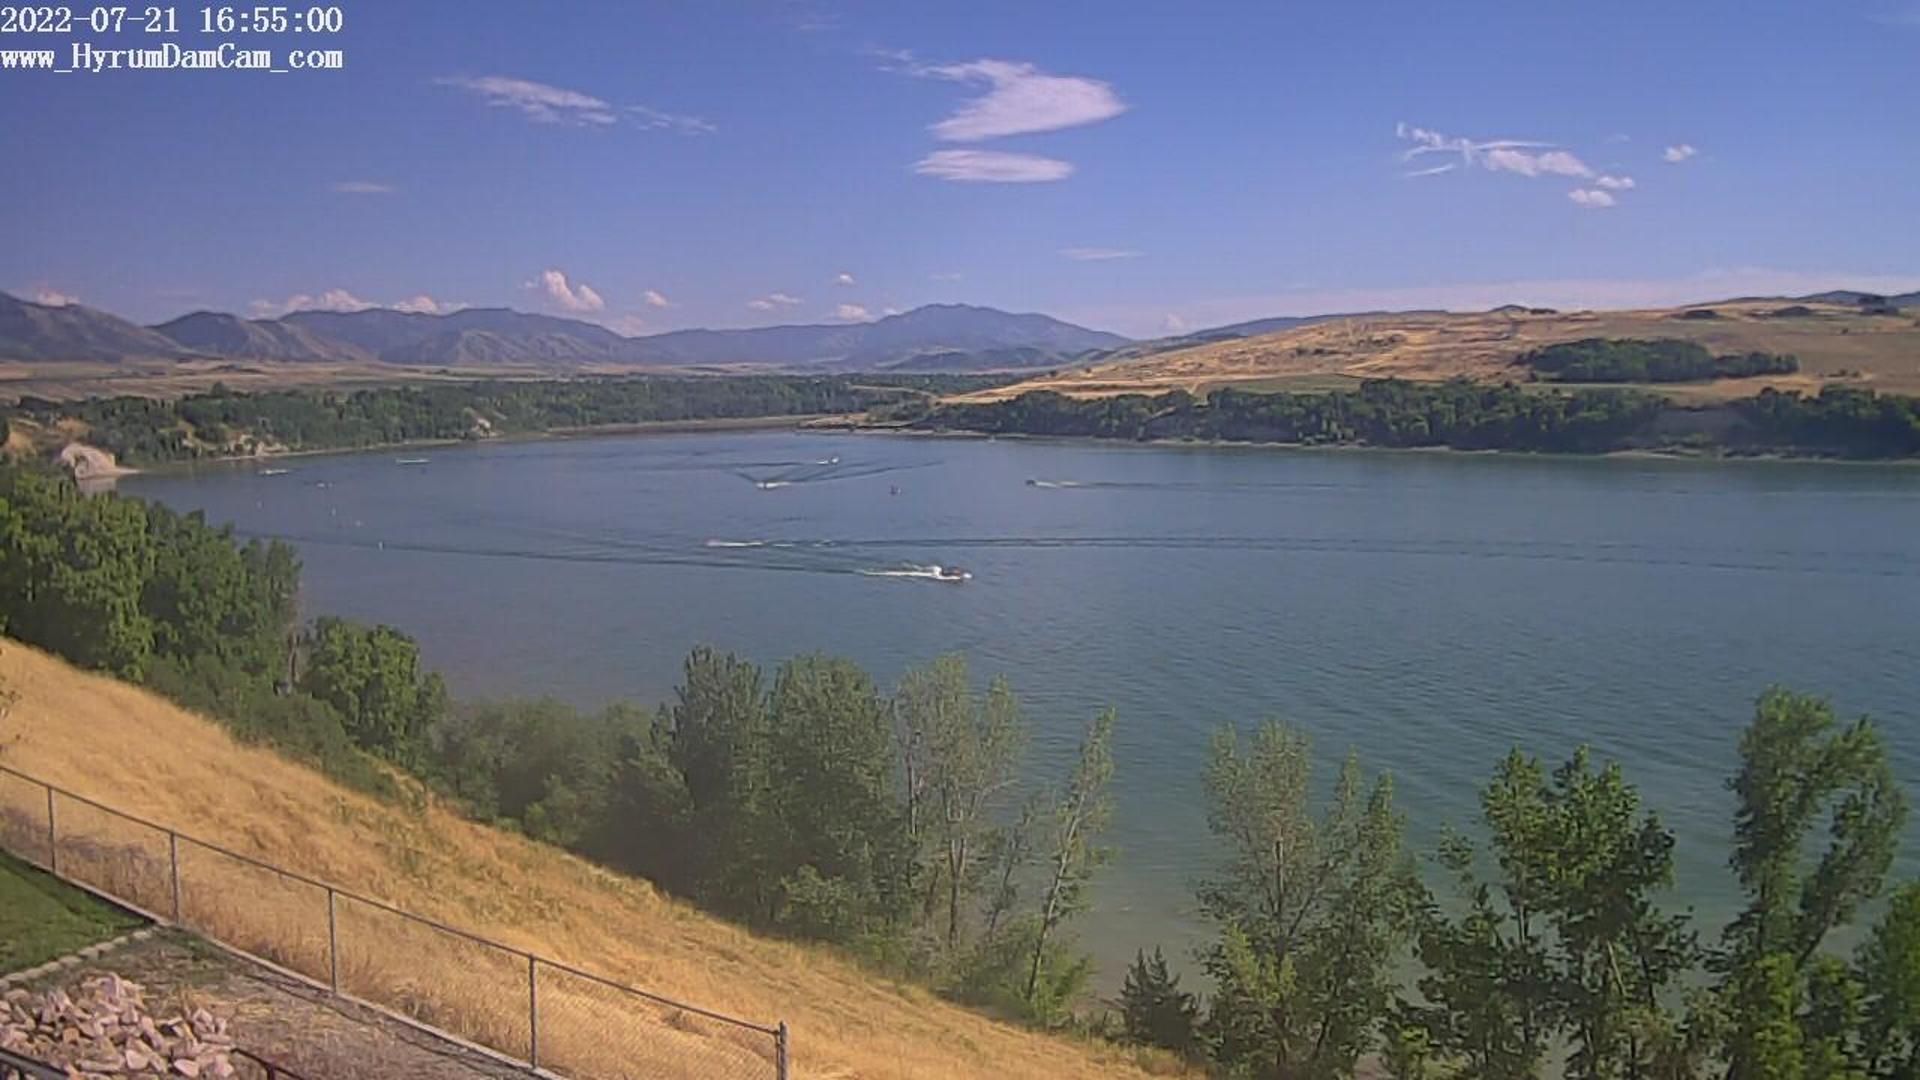 Webcam Hyrum: Reservoir − SE